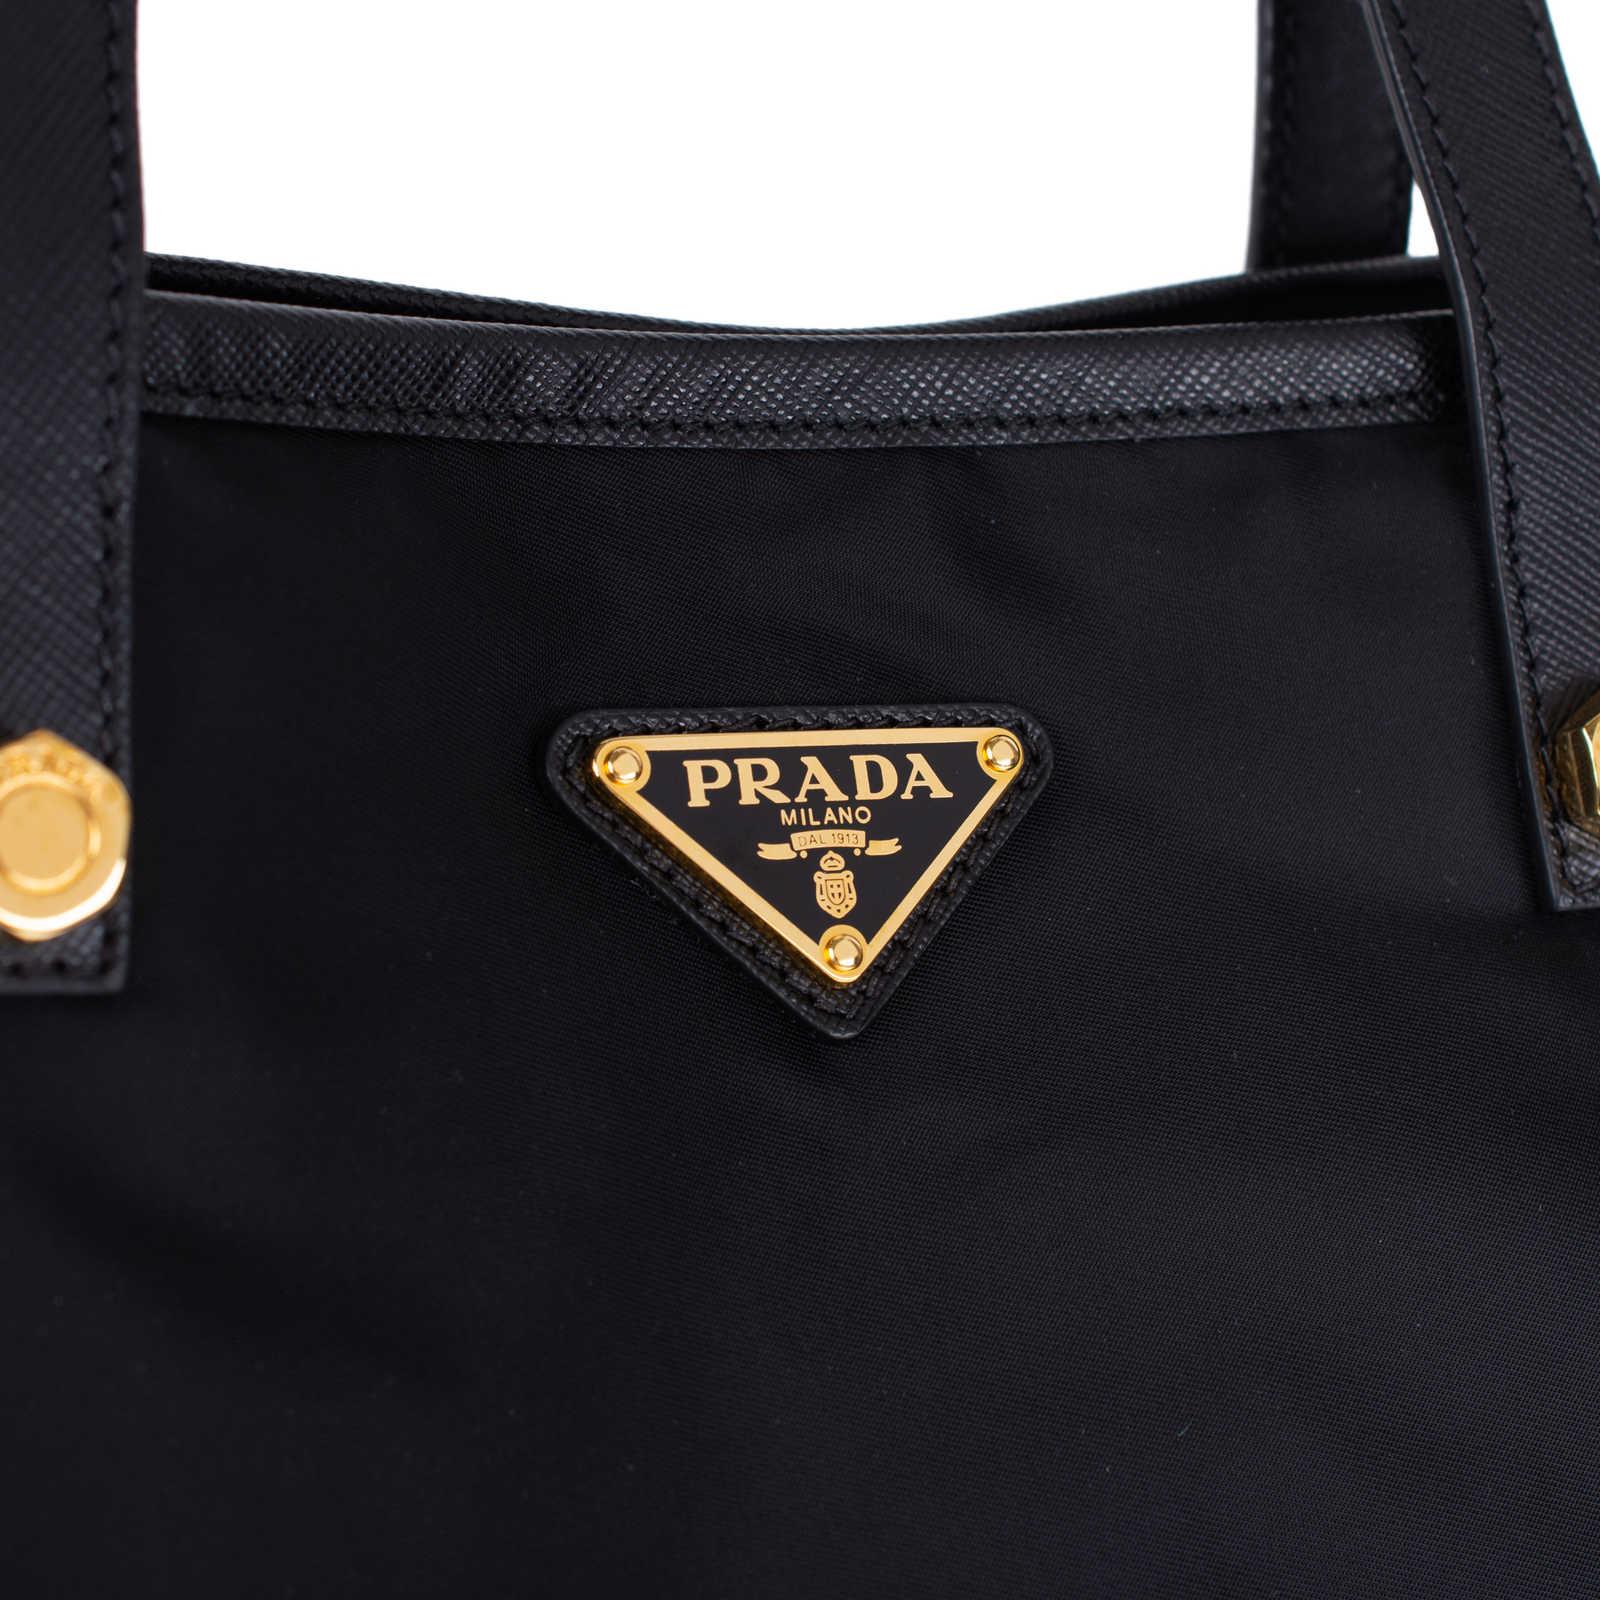 1e509be1f3d9 Authentic Pre Owned Prada Nylon Tote Bag (PSS-333-00029) - Thumbnail ... Shop  Prada Vela Blue Nylon Tote - Free Shipping Today ...